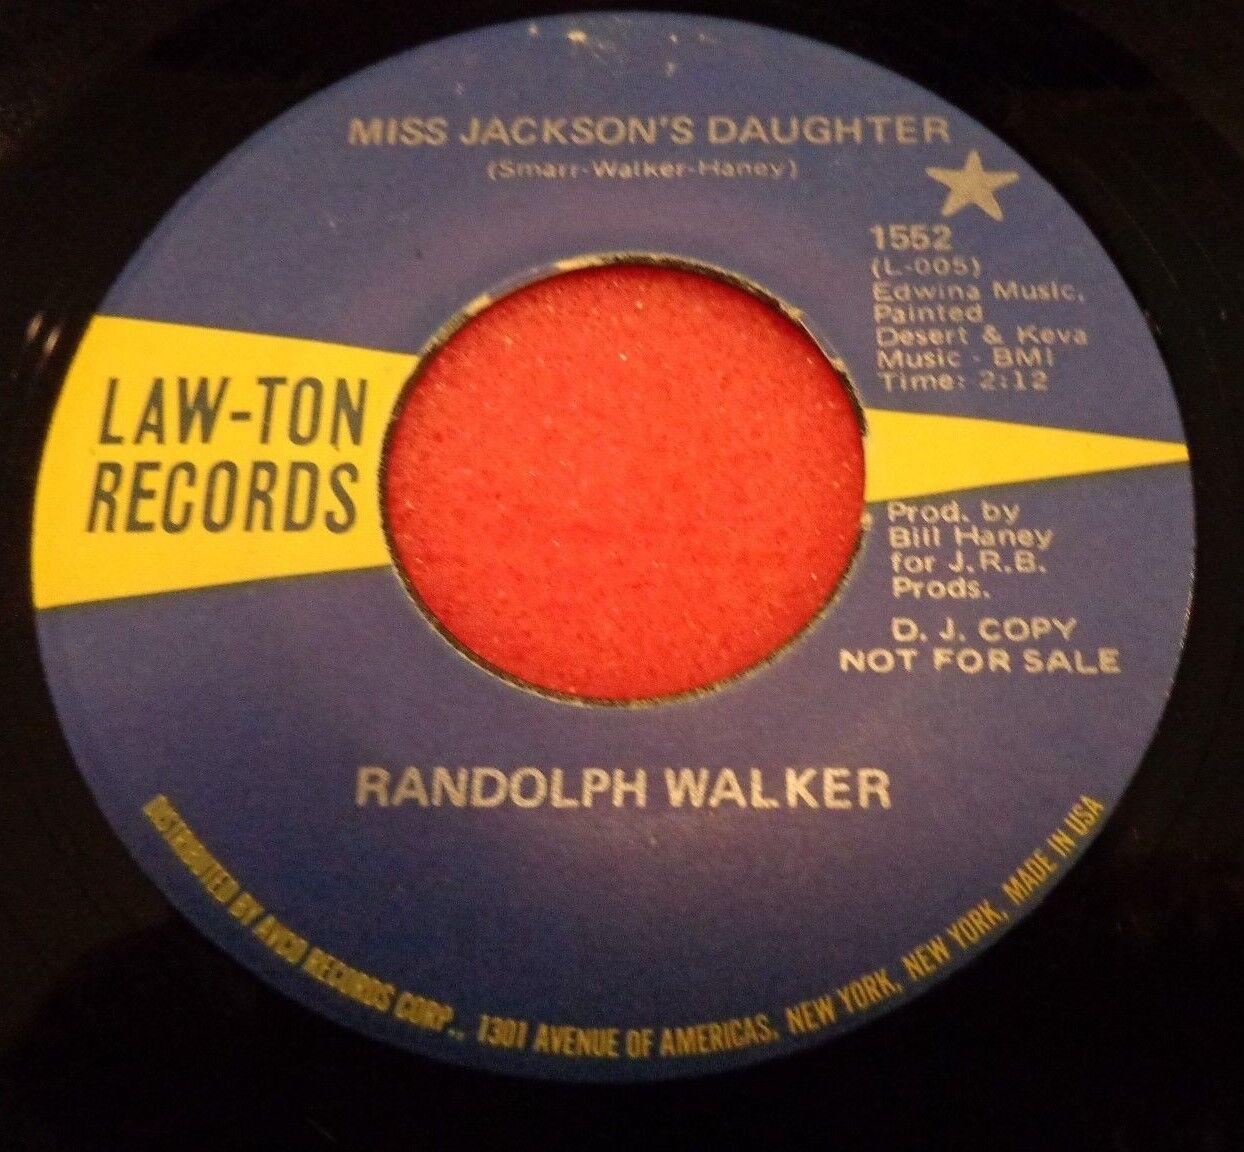 039..RARE Mortal RANDOLPH WALKER PROMO 45...MISS JACKSON'S DAUGHTER ...LAWTON 1552